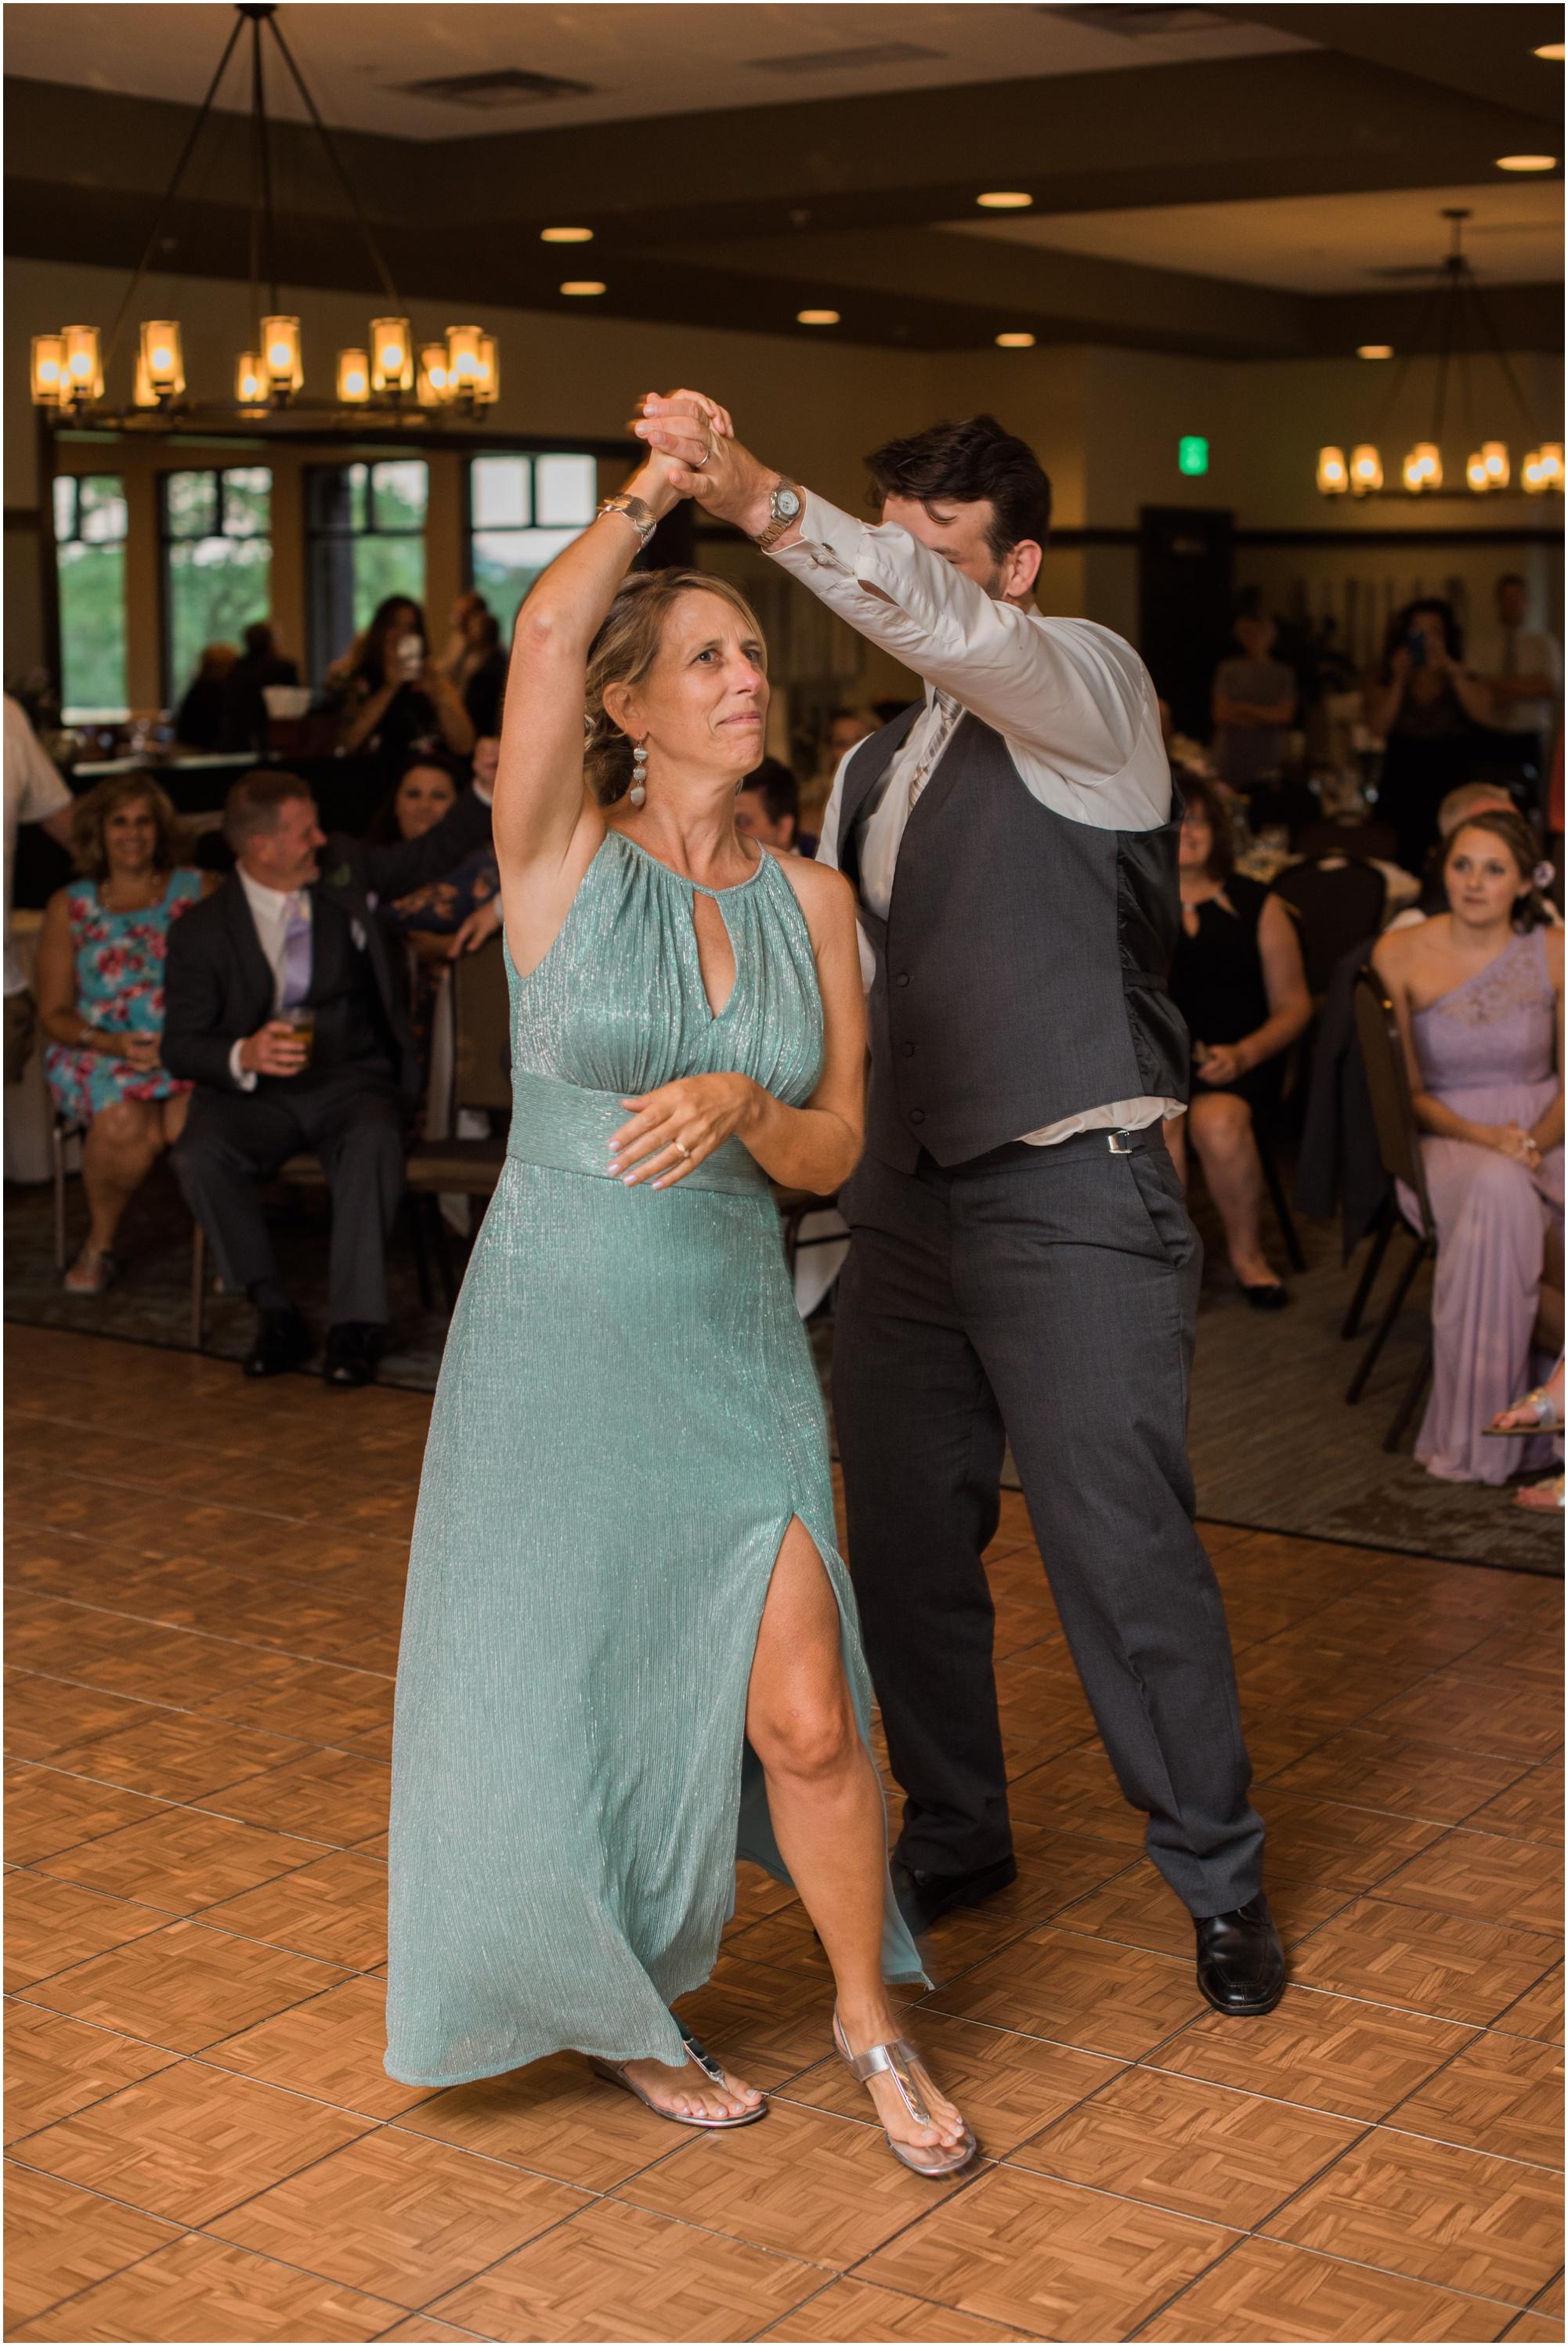 Wisconsin-Wedding-Photographer-Reedsburg-Country-Club-Kaela-and Matt-Wedding-909.jpg